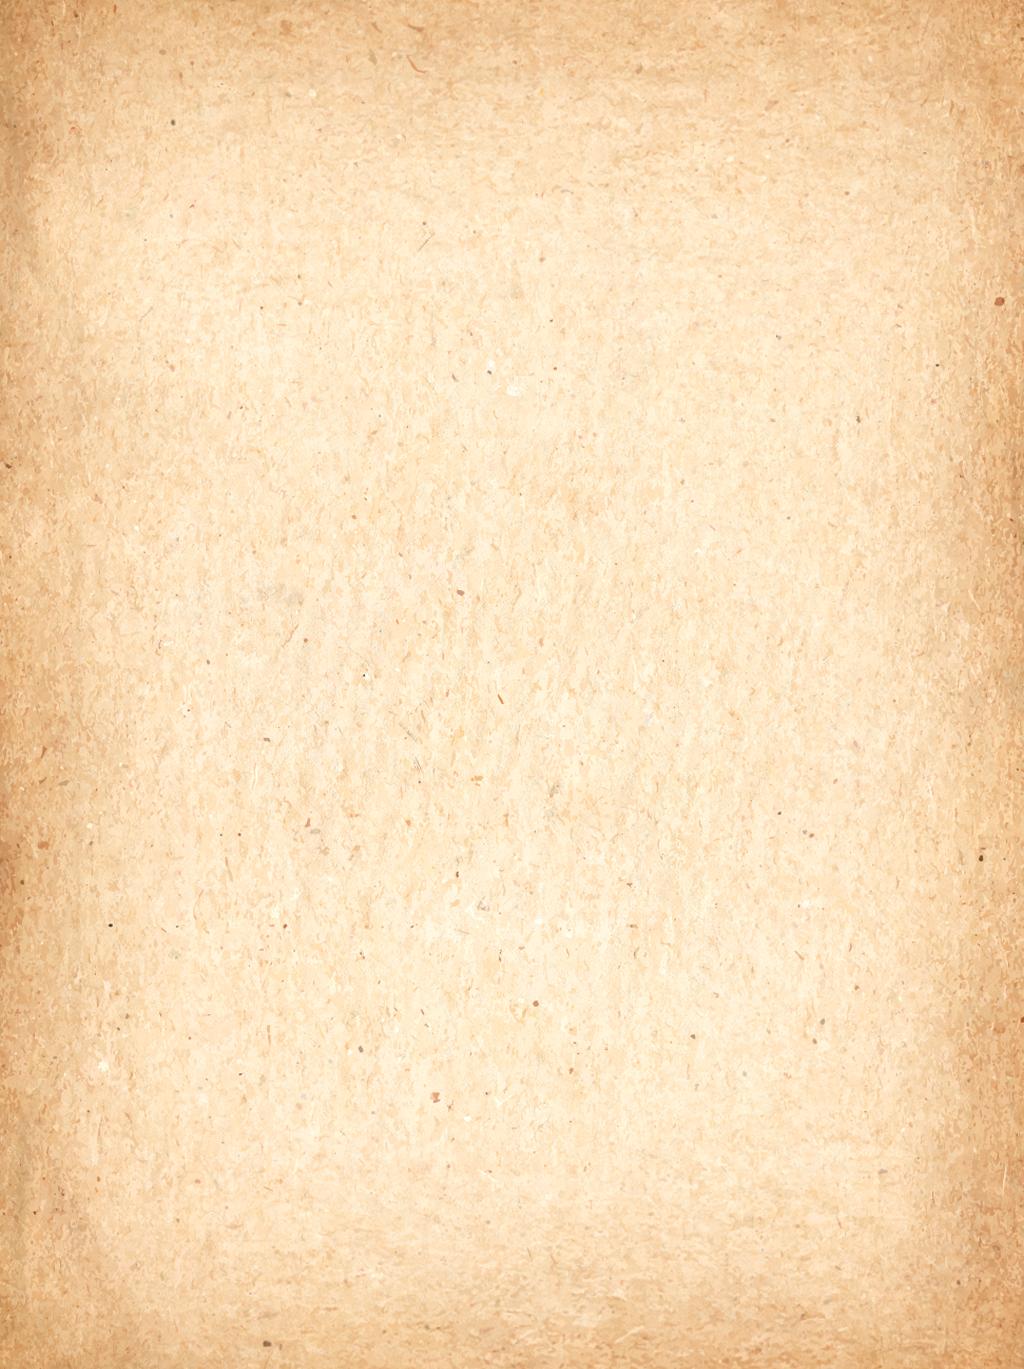 Pure Retro Vintage Kraft Paper Texture Background In 2020 Paper Background Texture Paper Texture Textured Background